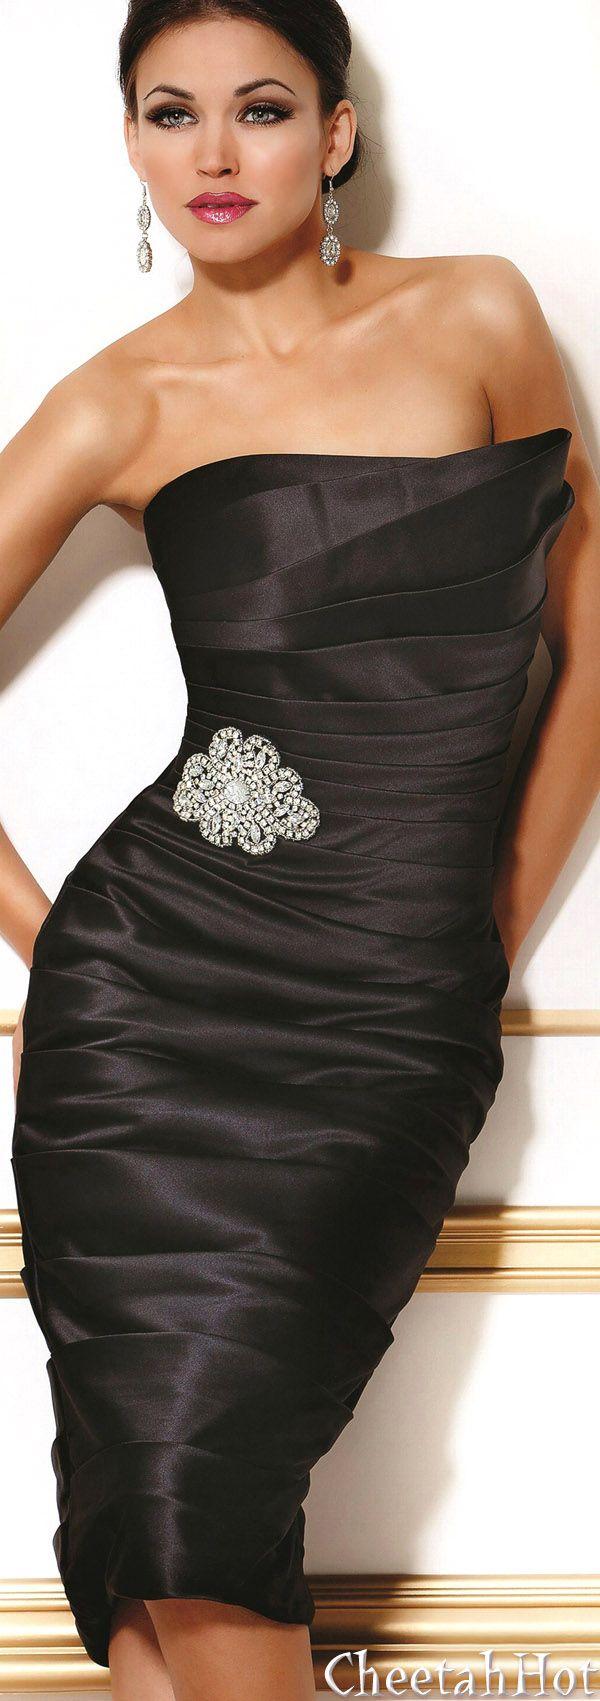 JOVANI - Sleek & Lovely Gown - bridesmaid